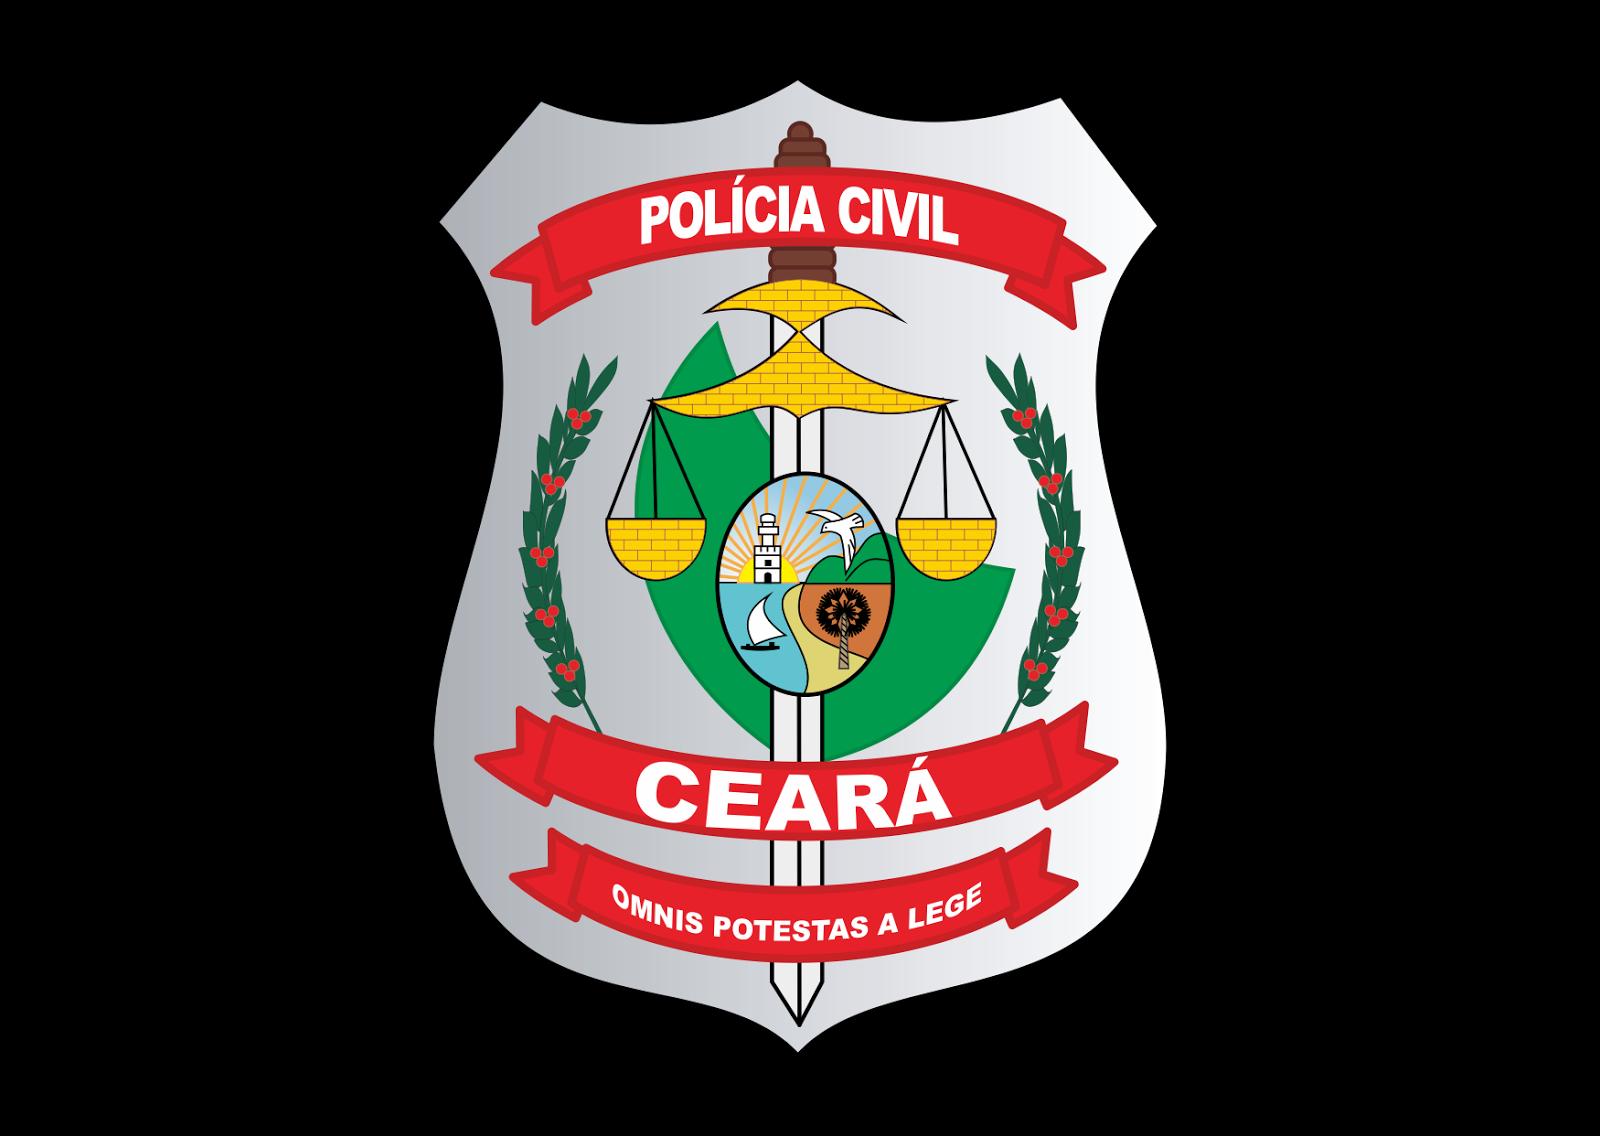 Policia Civil Do Ceara Governo Do Estado Do Ceara Logo Vector Format Cdr Ai Eps Svg Pdf Png